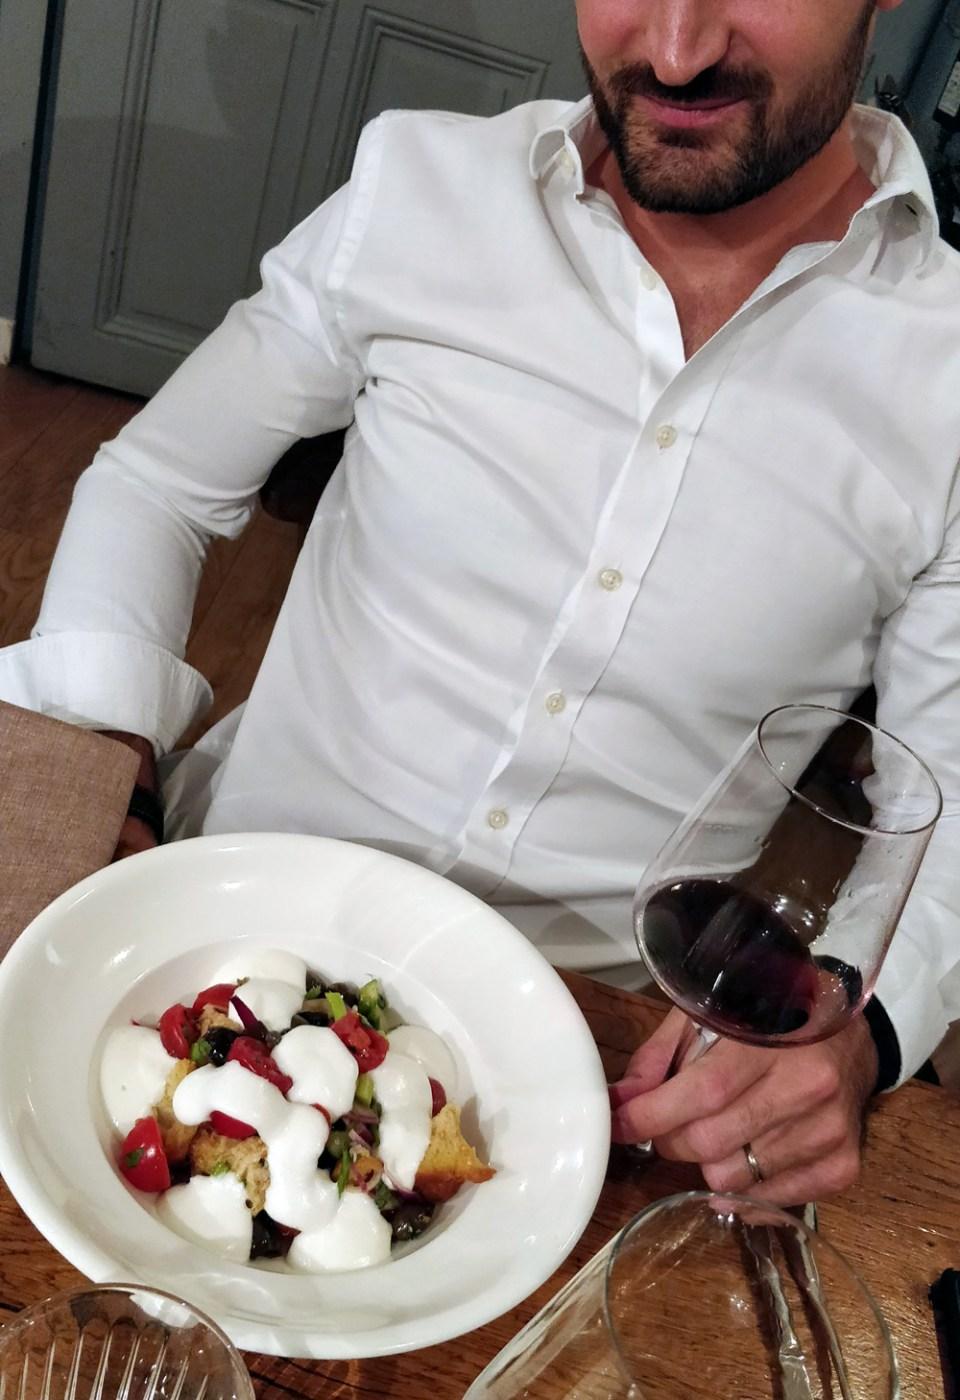 mercredie-blog-mode-geneve-lifestyle-geneva-swiss-blogger-blogueuse-bloggeuse-food-restaurants-geneve-meilleurs-restos-avis-ciro-italien-trattoria-gourmet-rue-de-berne-paquis